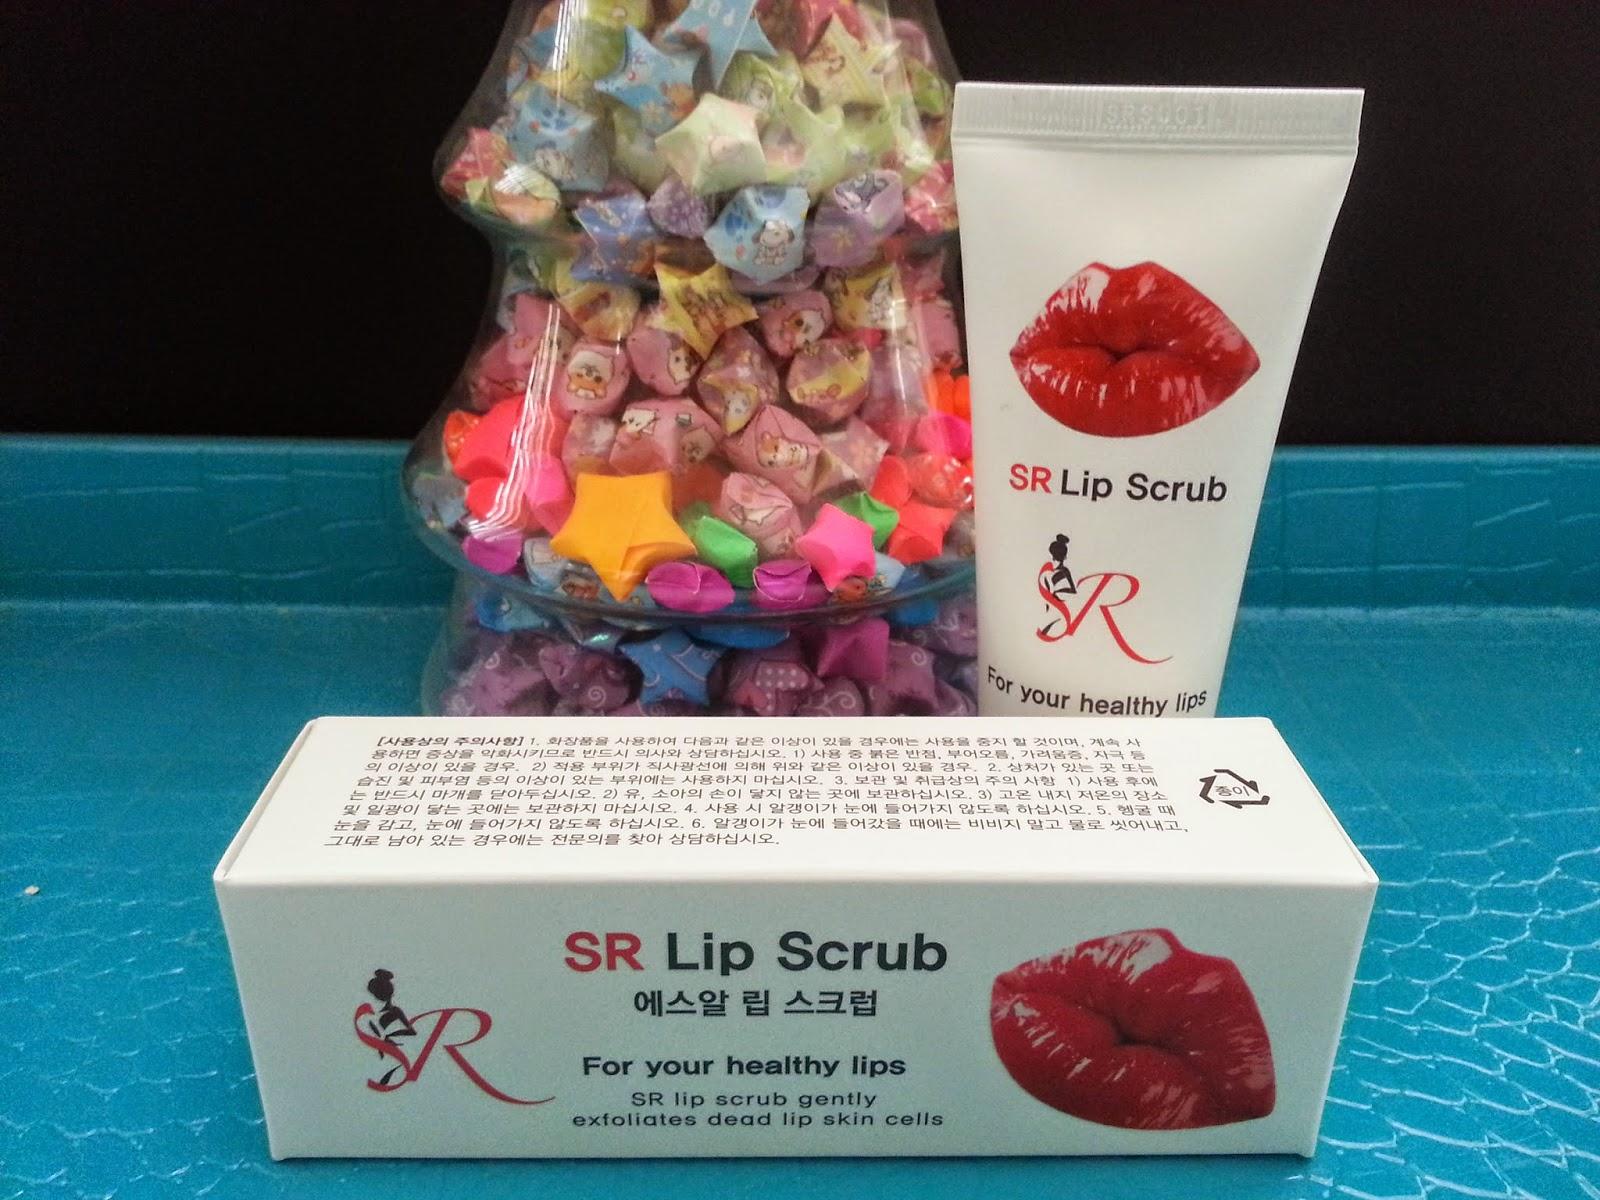 SR Lip Scrub